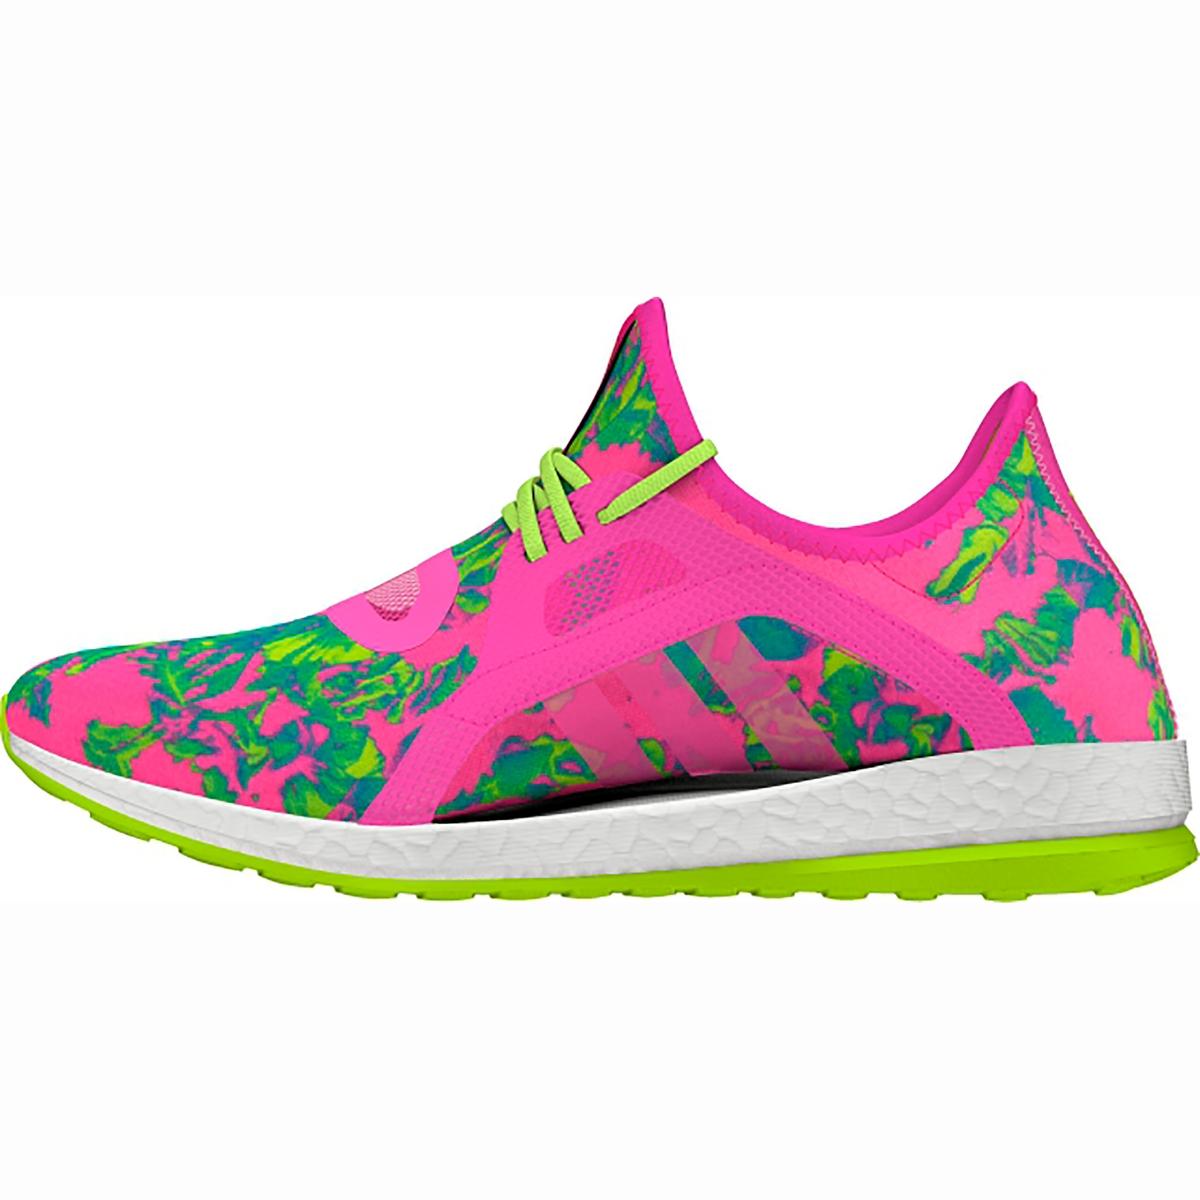 Adidas PUREBOOST X RUNNING